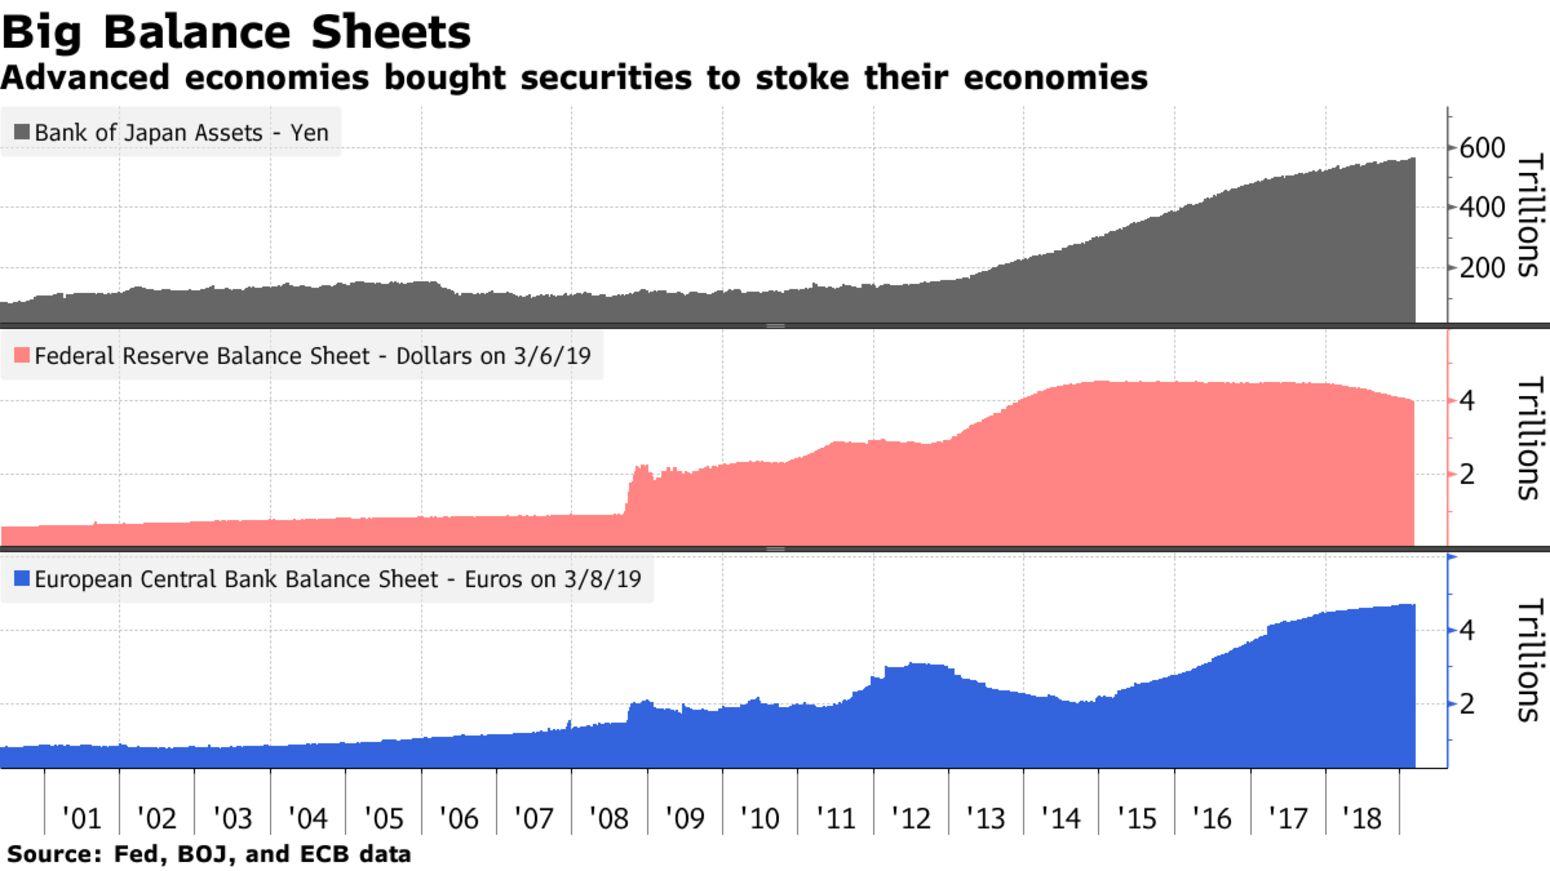 Advanced economies bought securities to stoke their economies